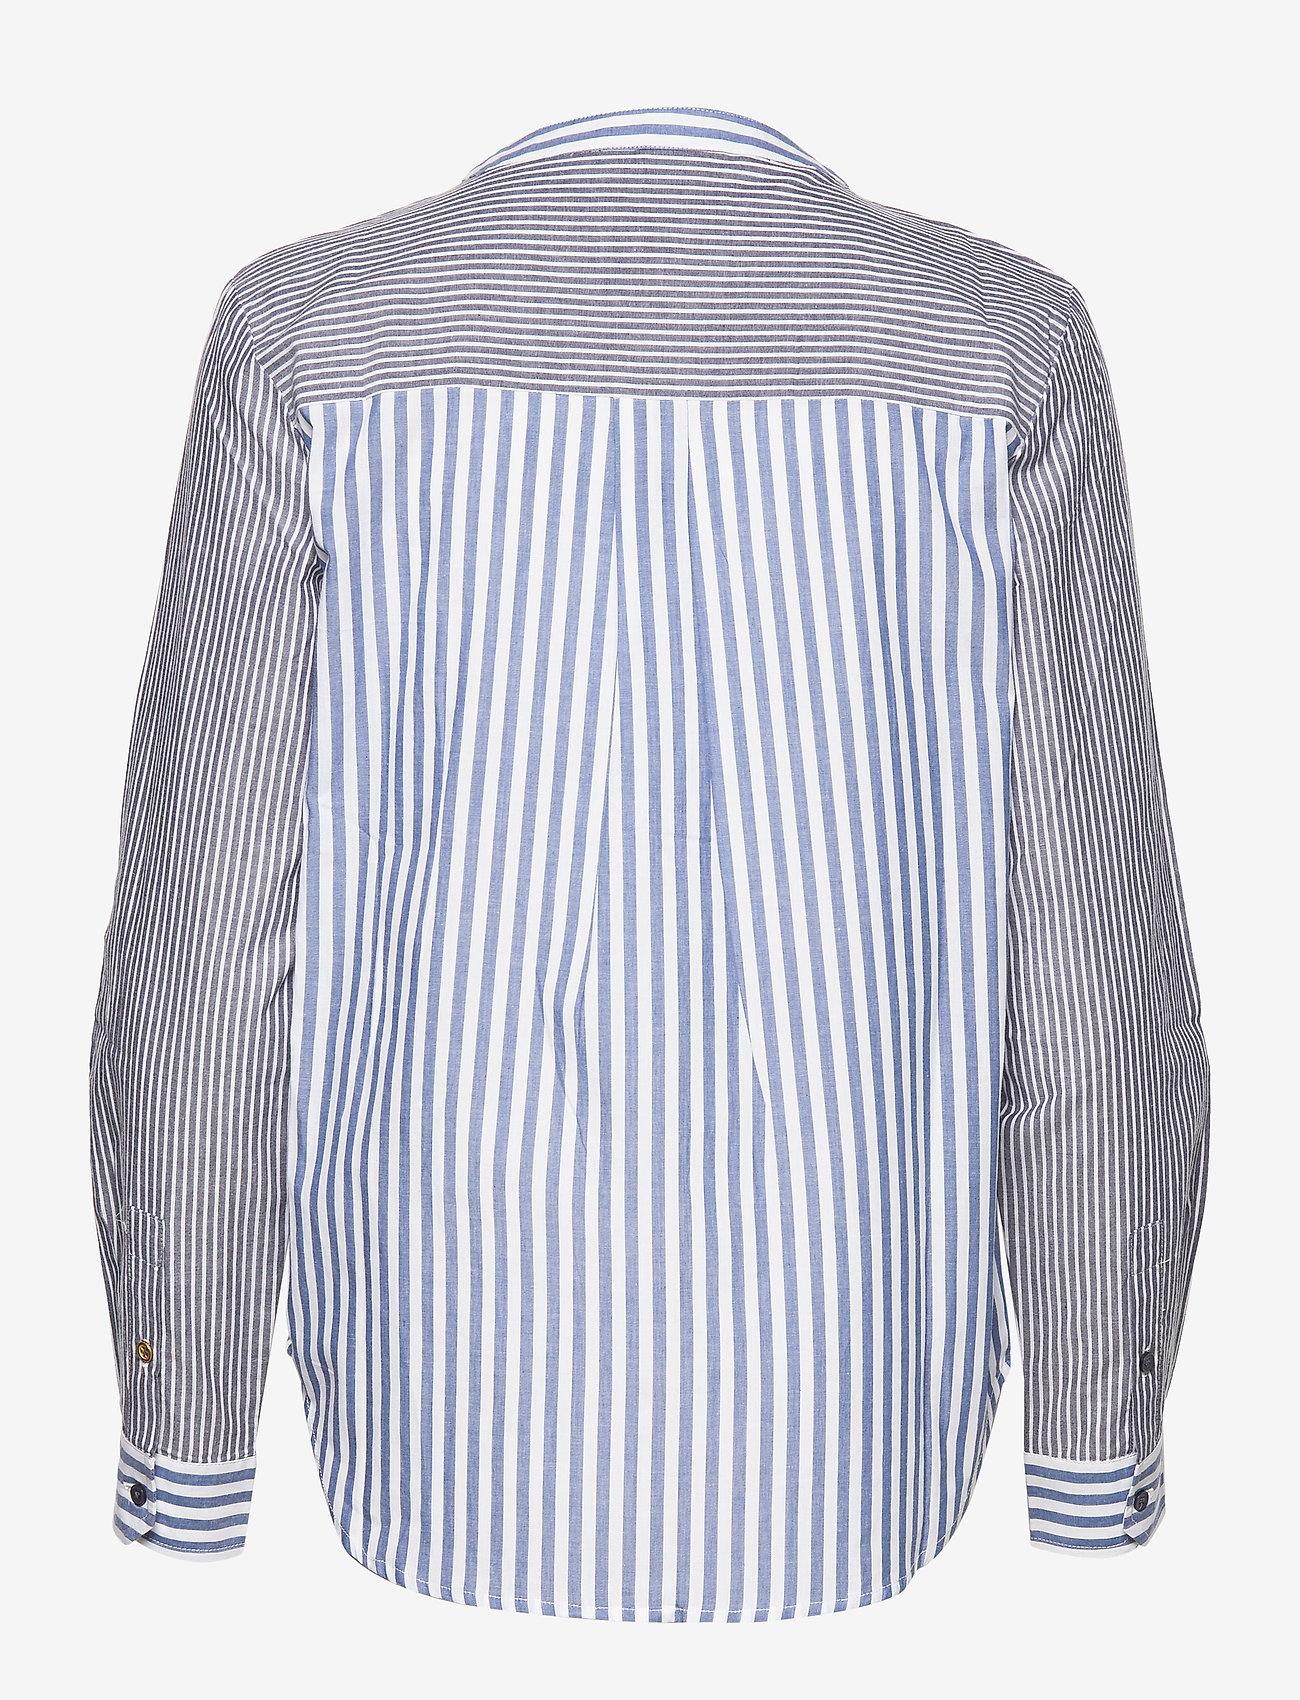 Iris Shirt (Blue) (405 kr) - Lollys Laundry